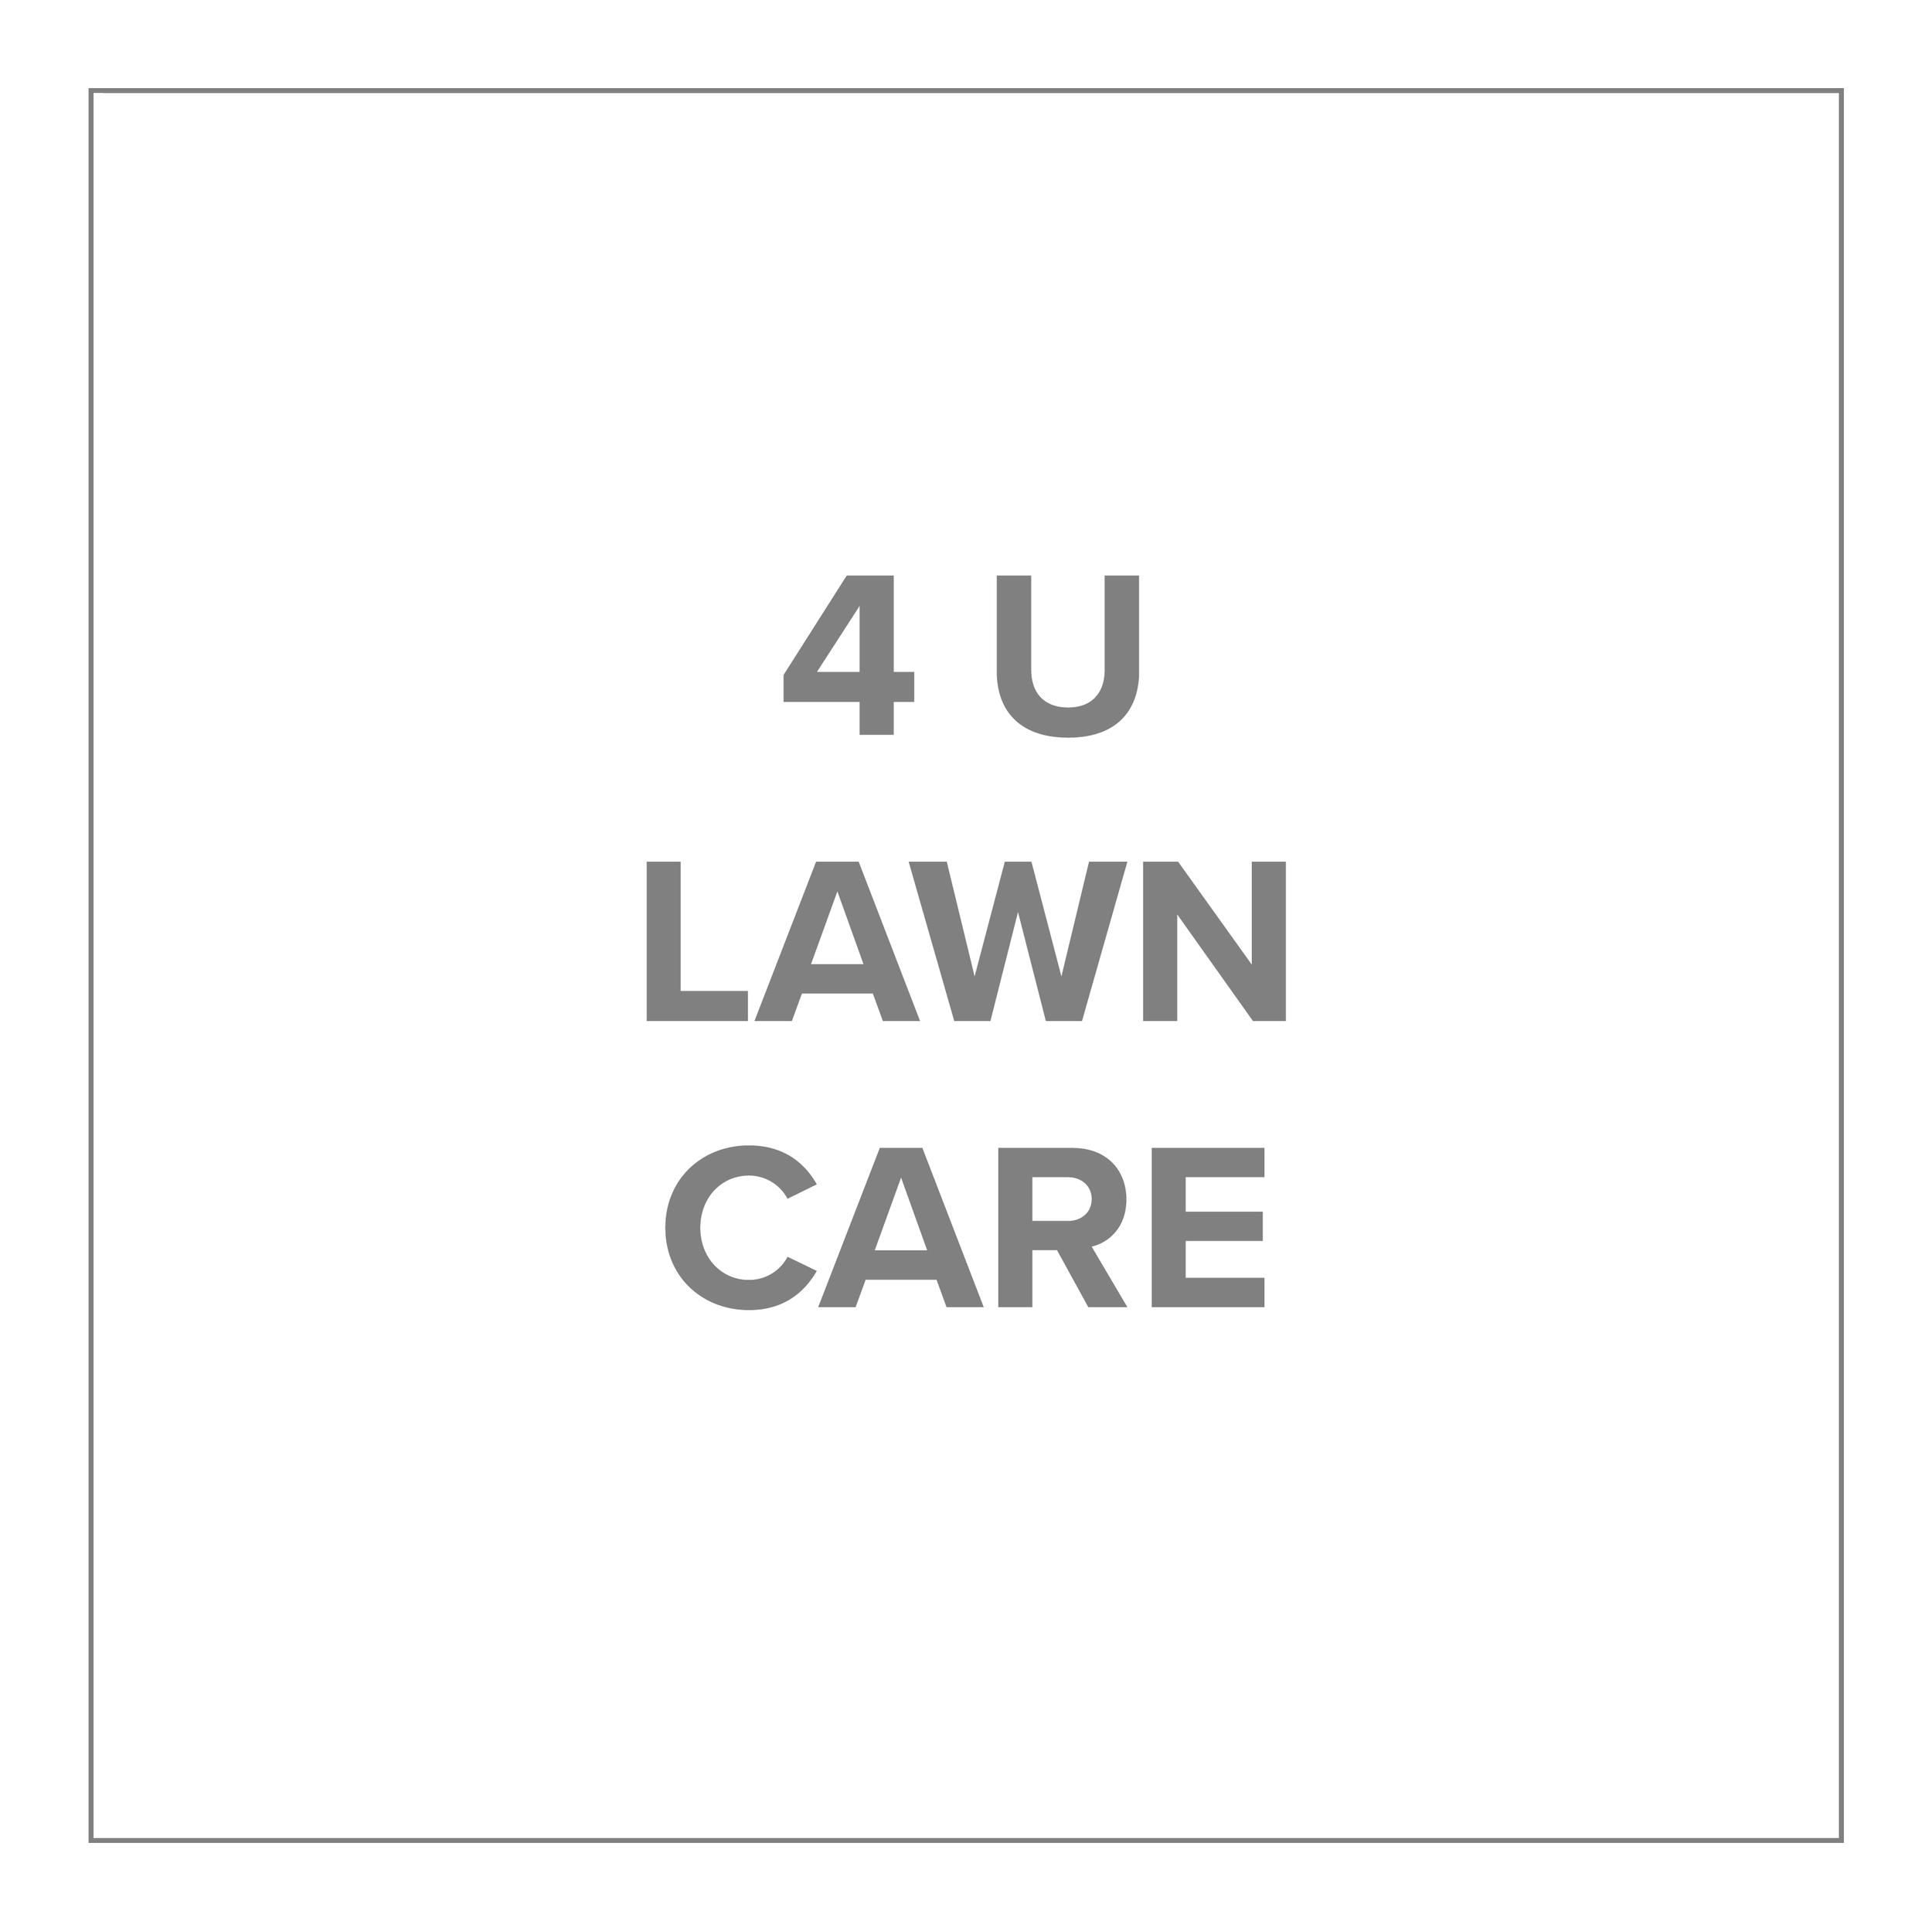 4 U Lawn Care